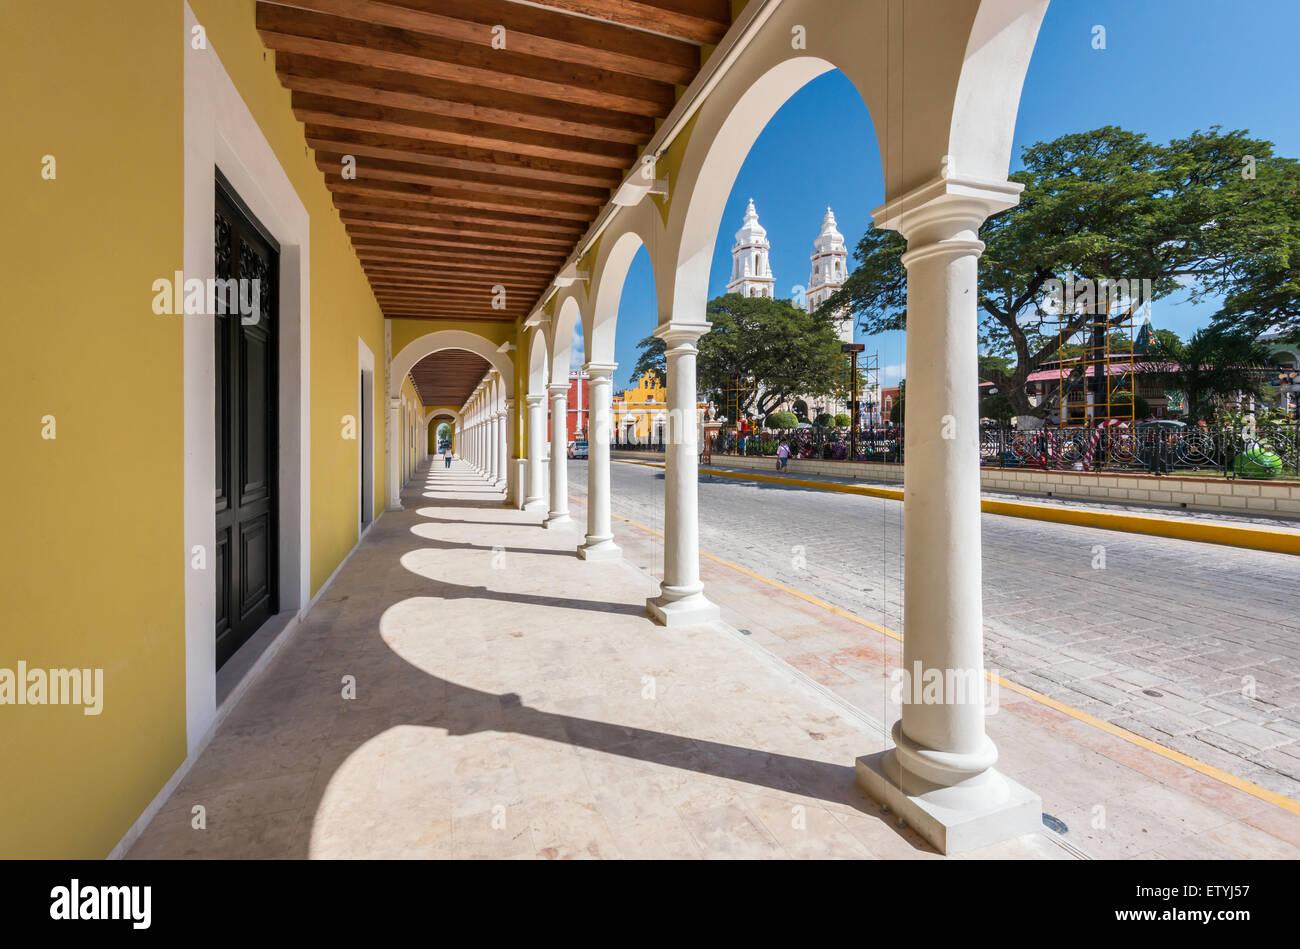 Arcade, covered walkway, at Centro Cultural El Palacio, Cathedral, Plaza Principal in Campeche, Yucatan Peninsula, - Stock Image